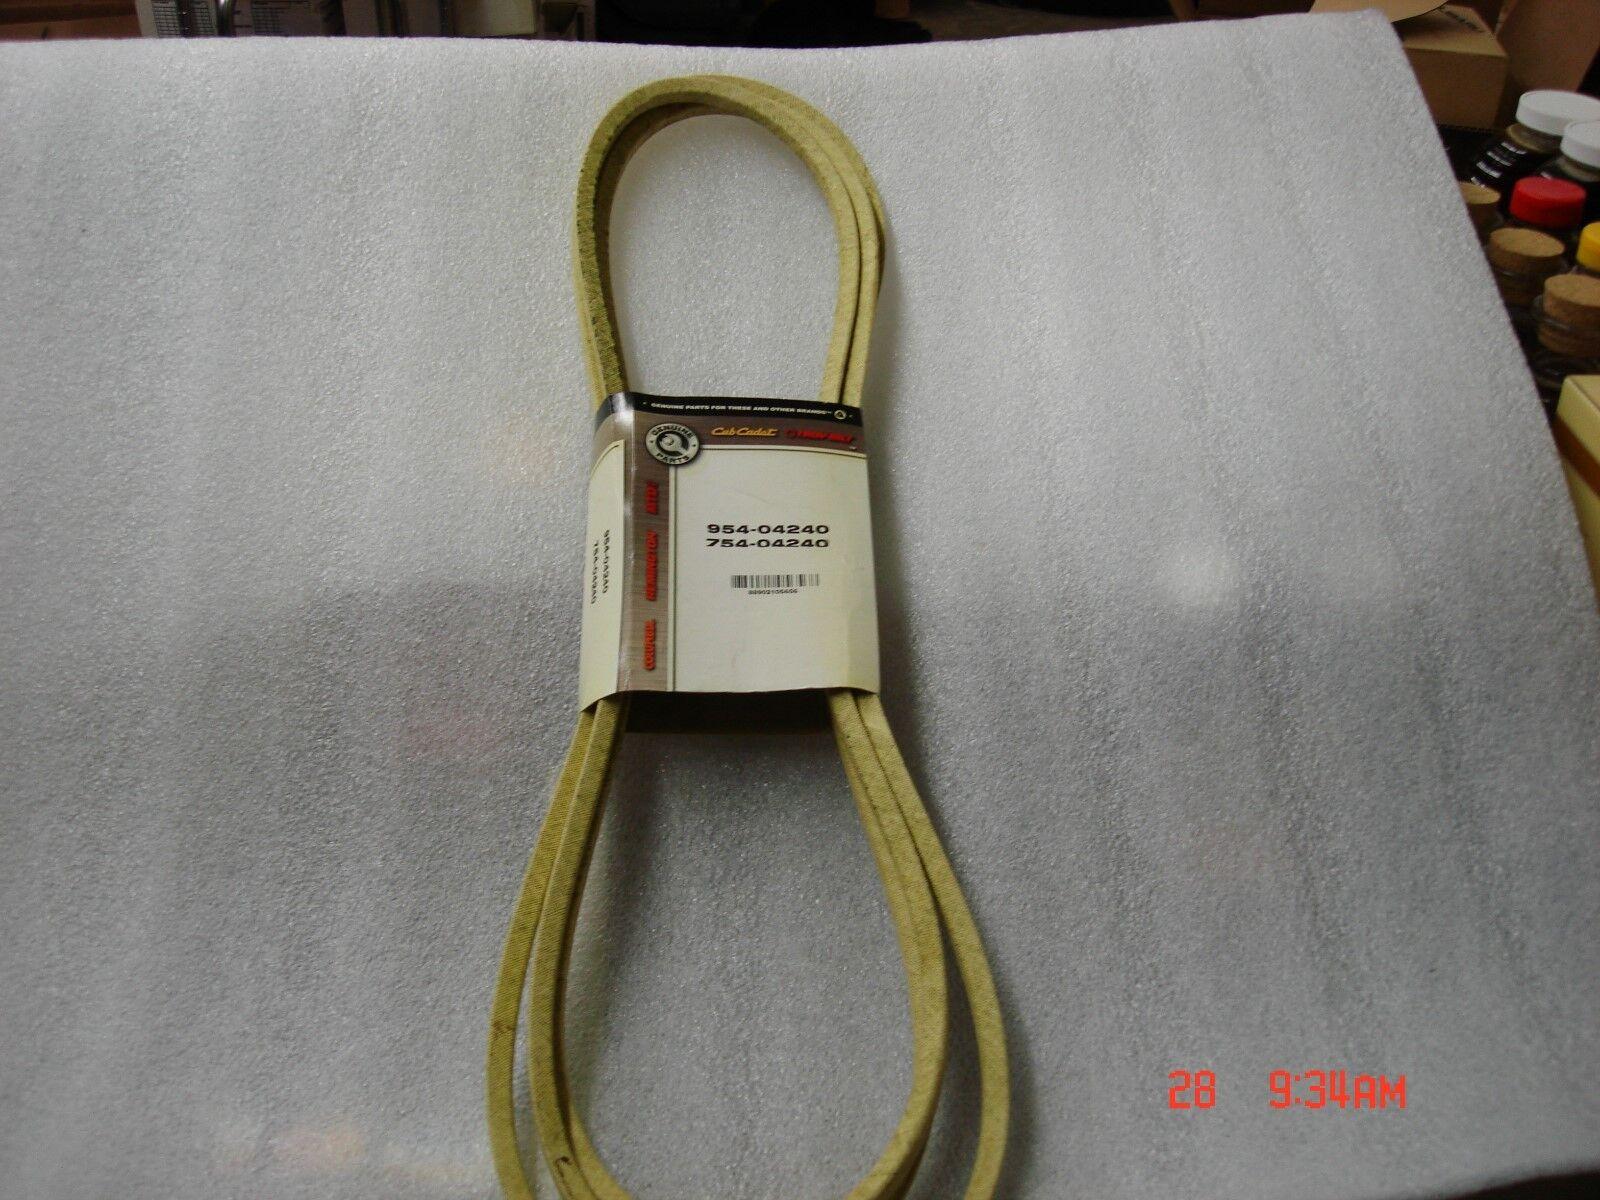 CUB CADET, MTD, TROYBILT 954-04240OR 754-04240 Cubierta Cinturón, OEM Original